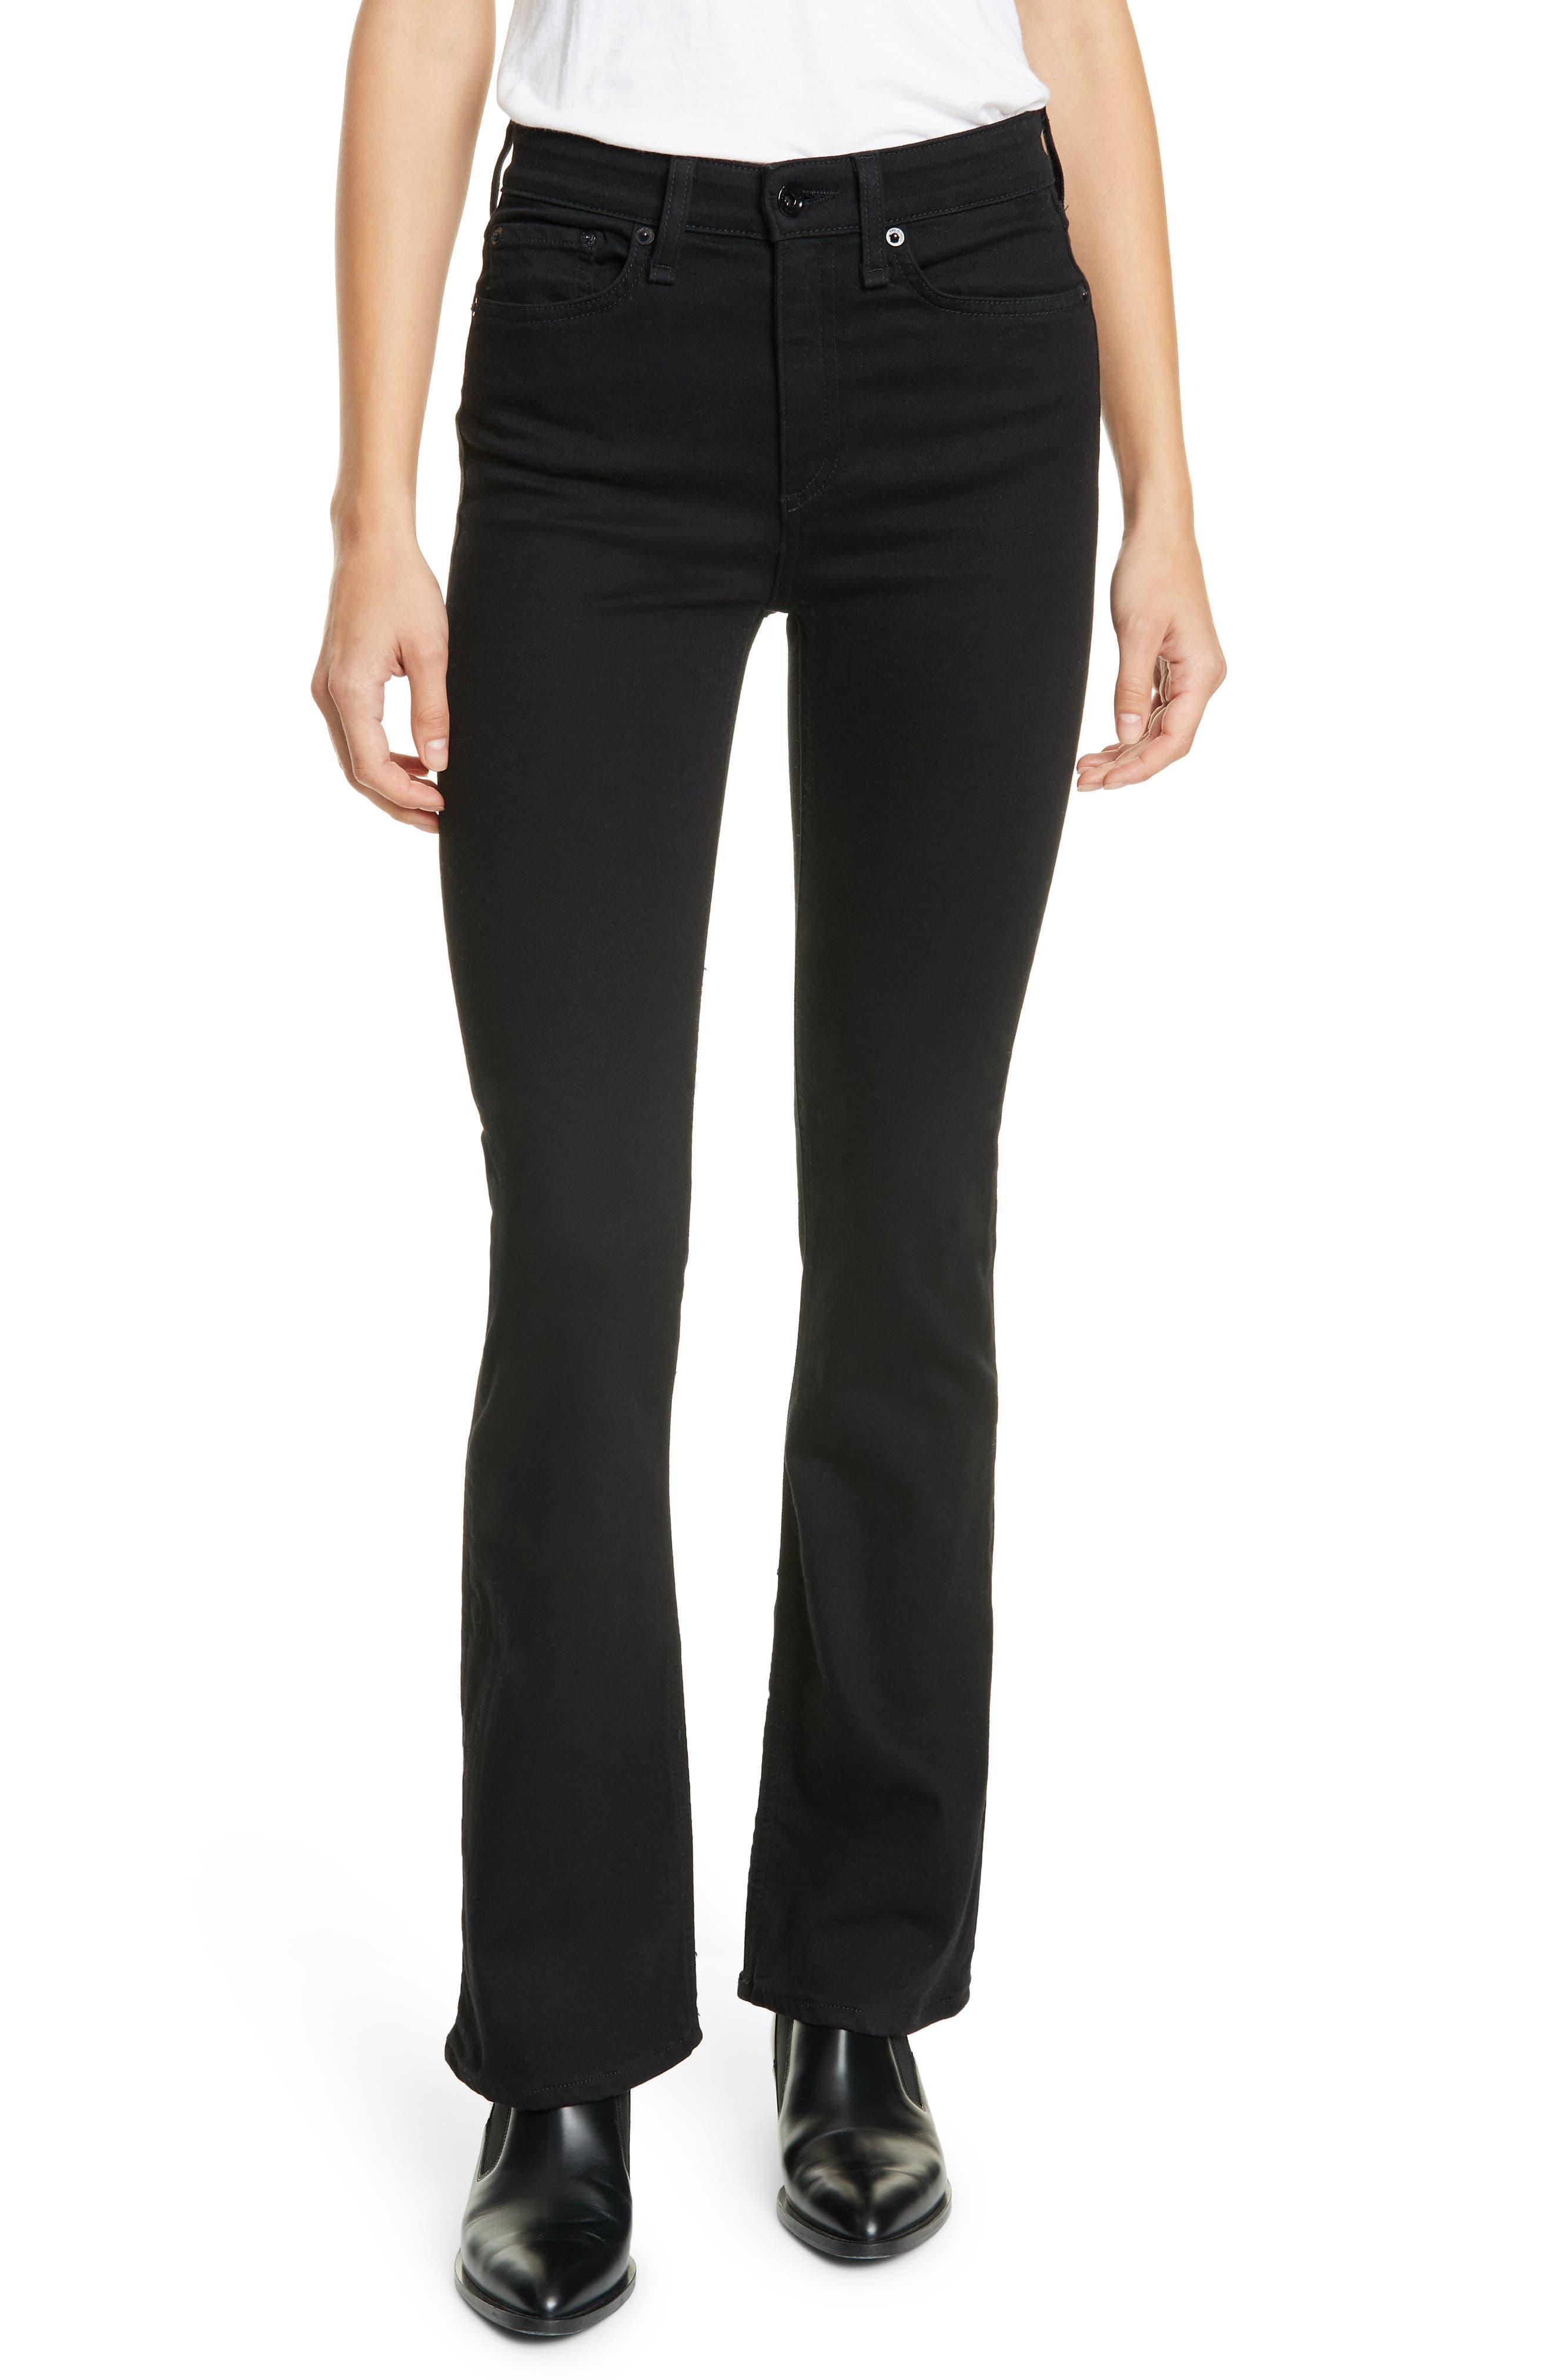 Women's Rag & Bone Nina High Rise Bootcut Jeans